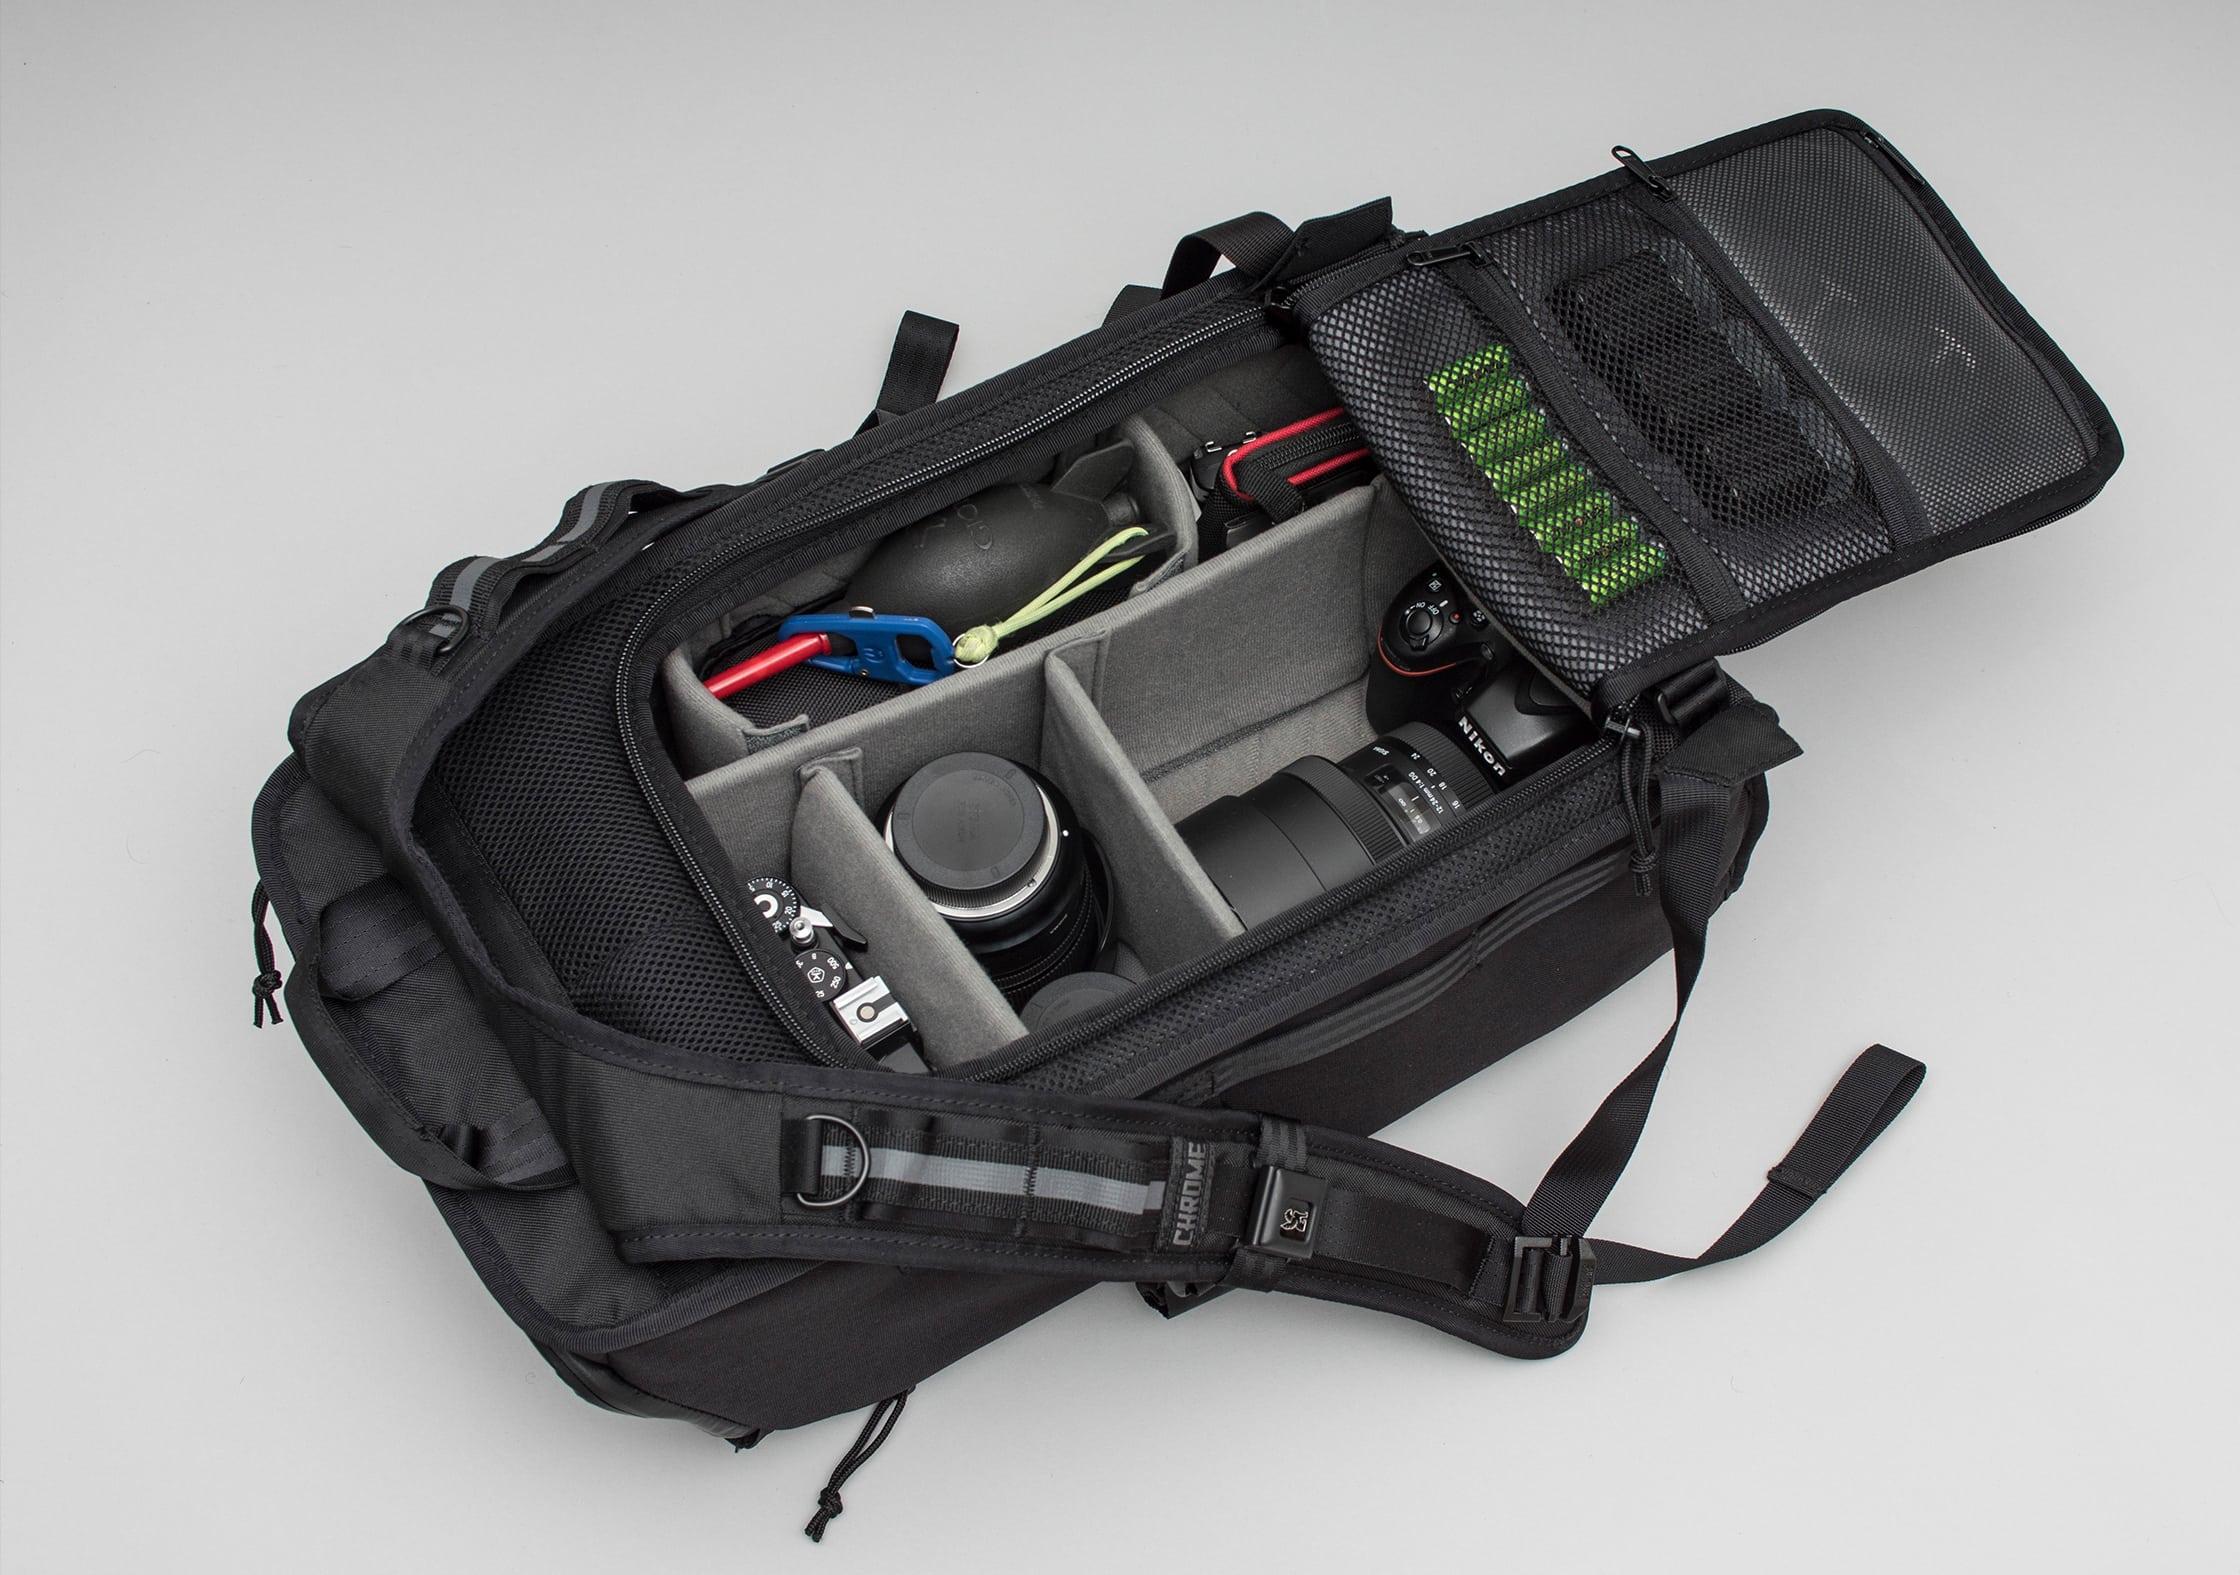 Chrome Niko Main Compartment